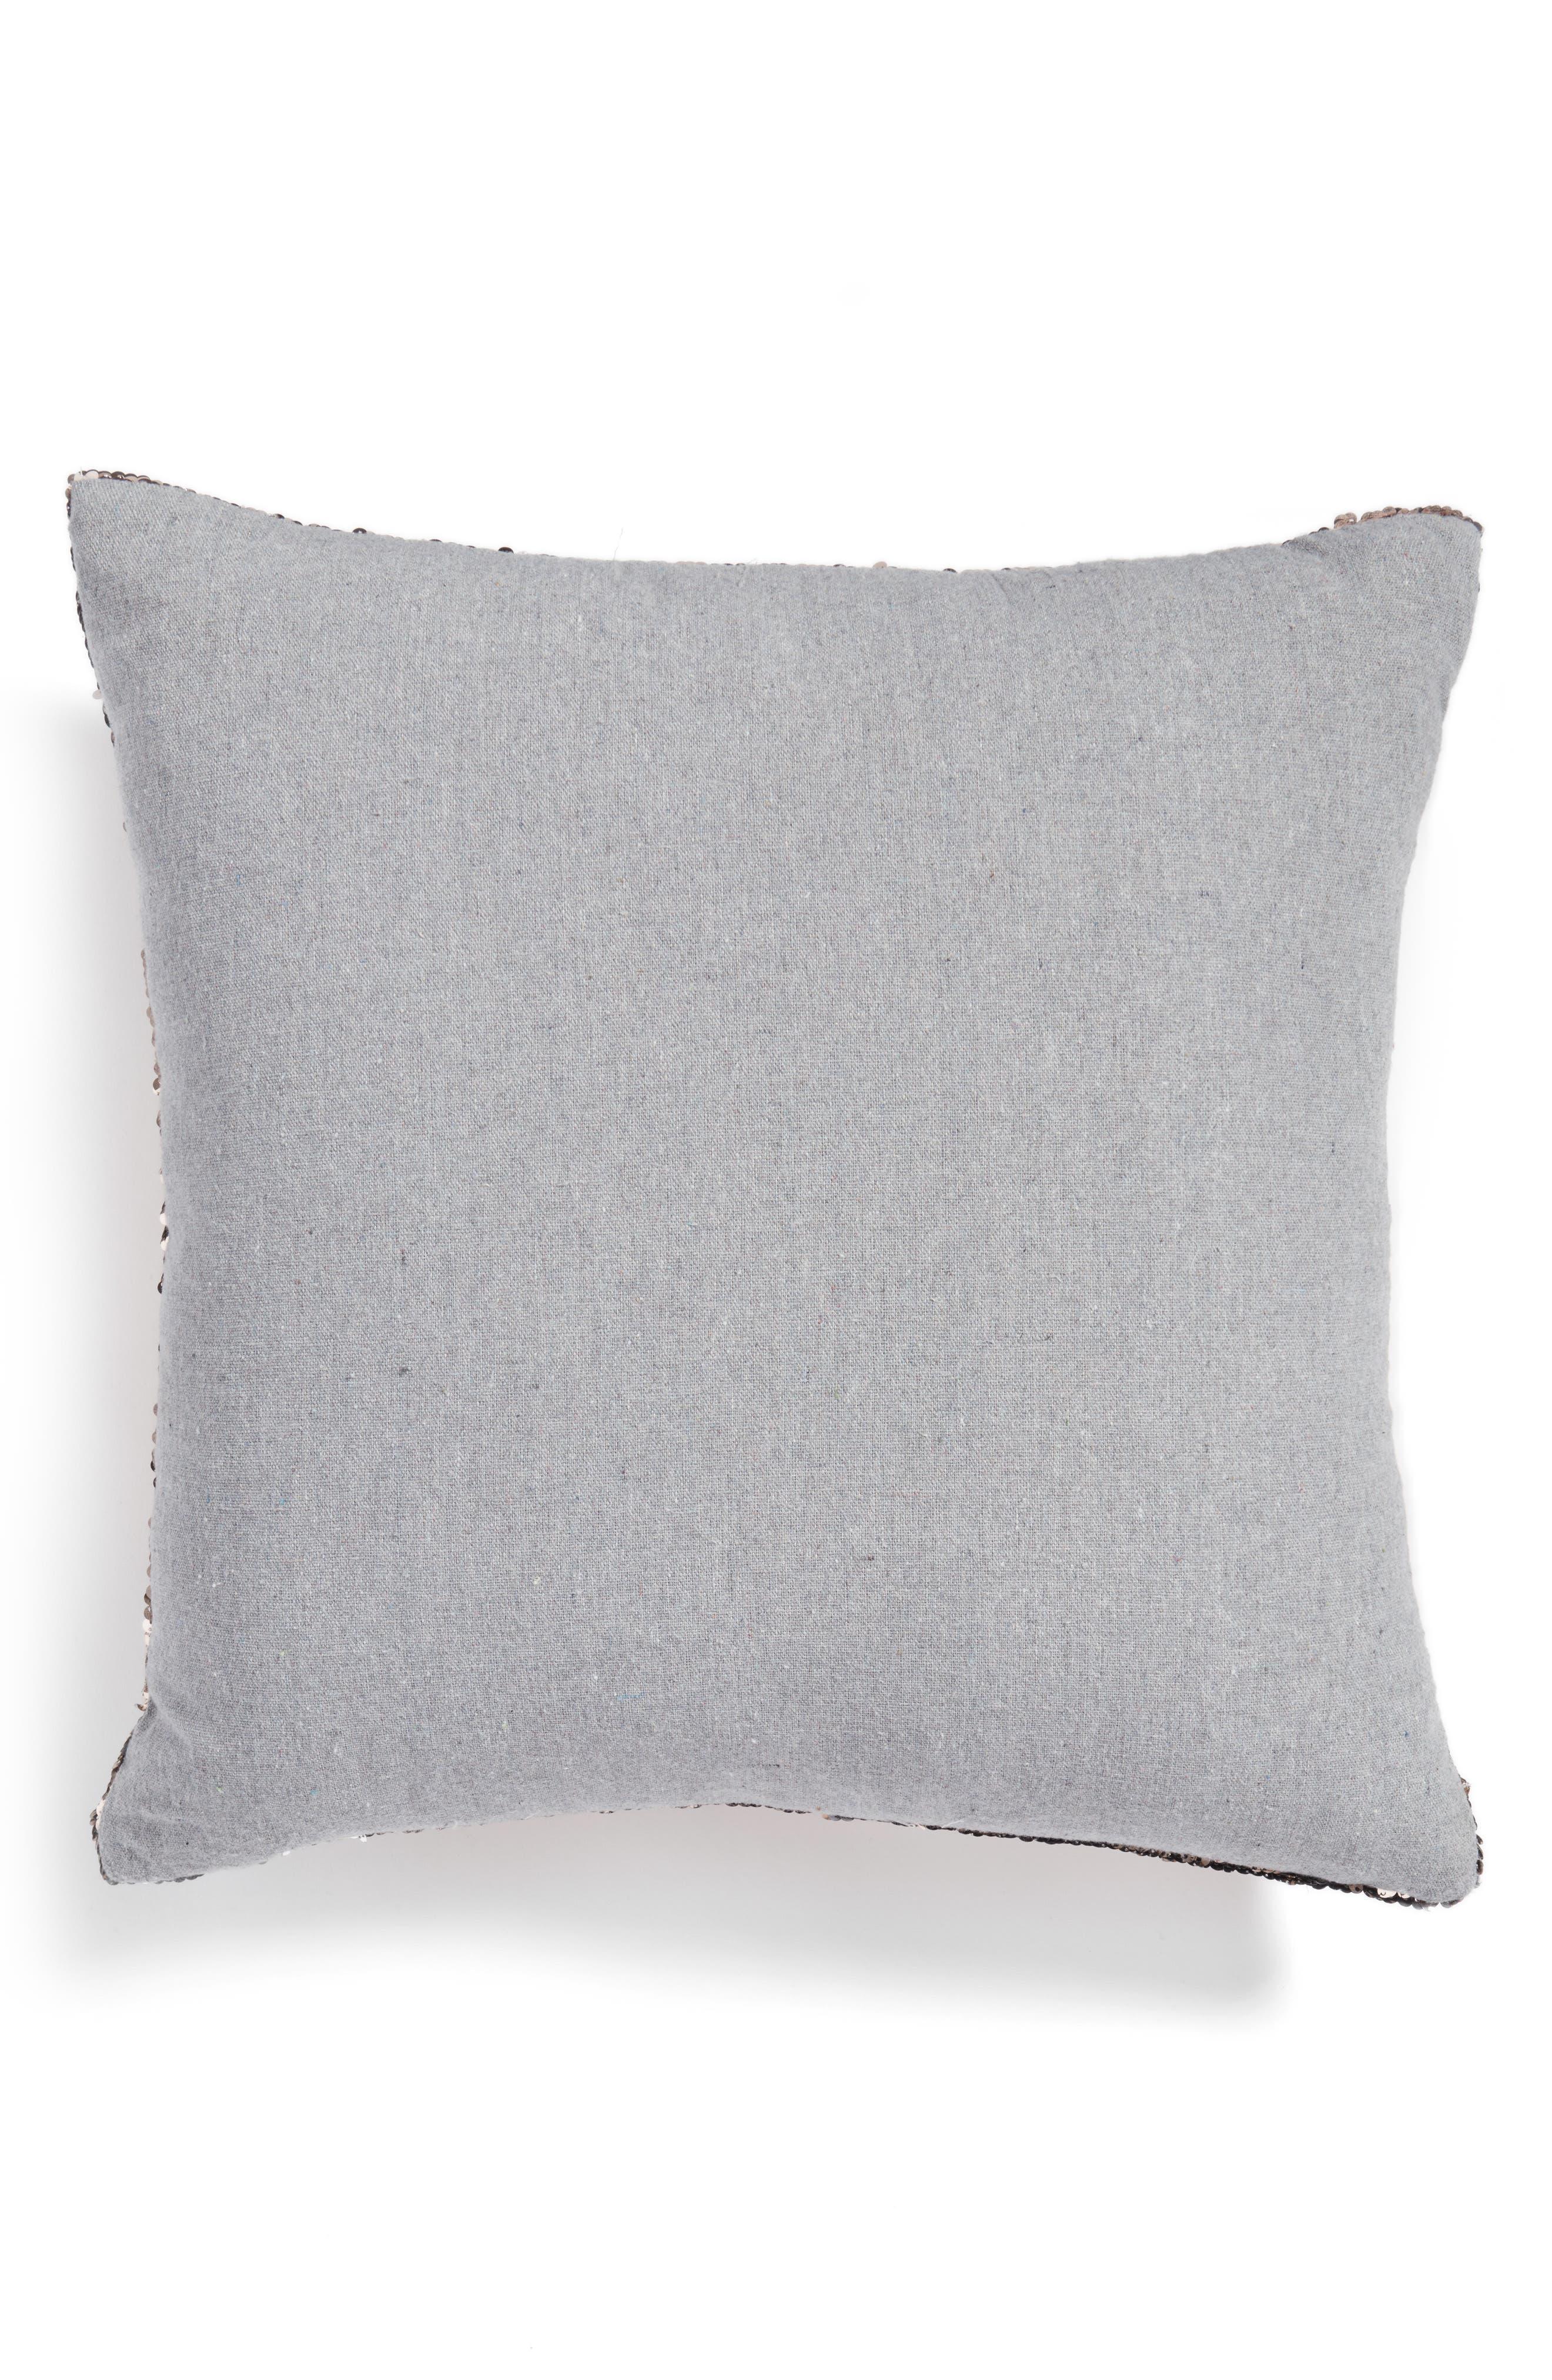 Sequin Pillow,                             Alternate thumbnail 2, color,                             Gold